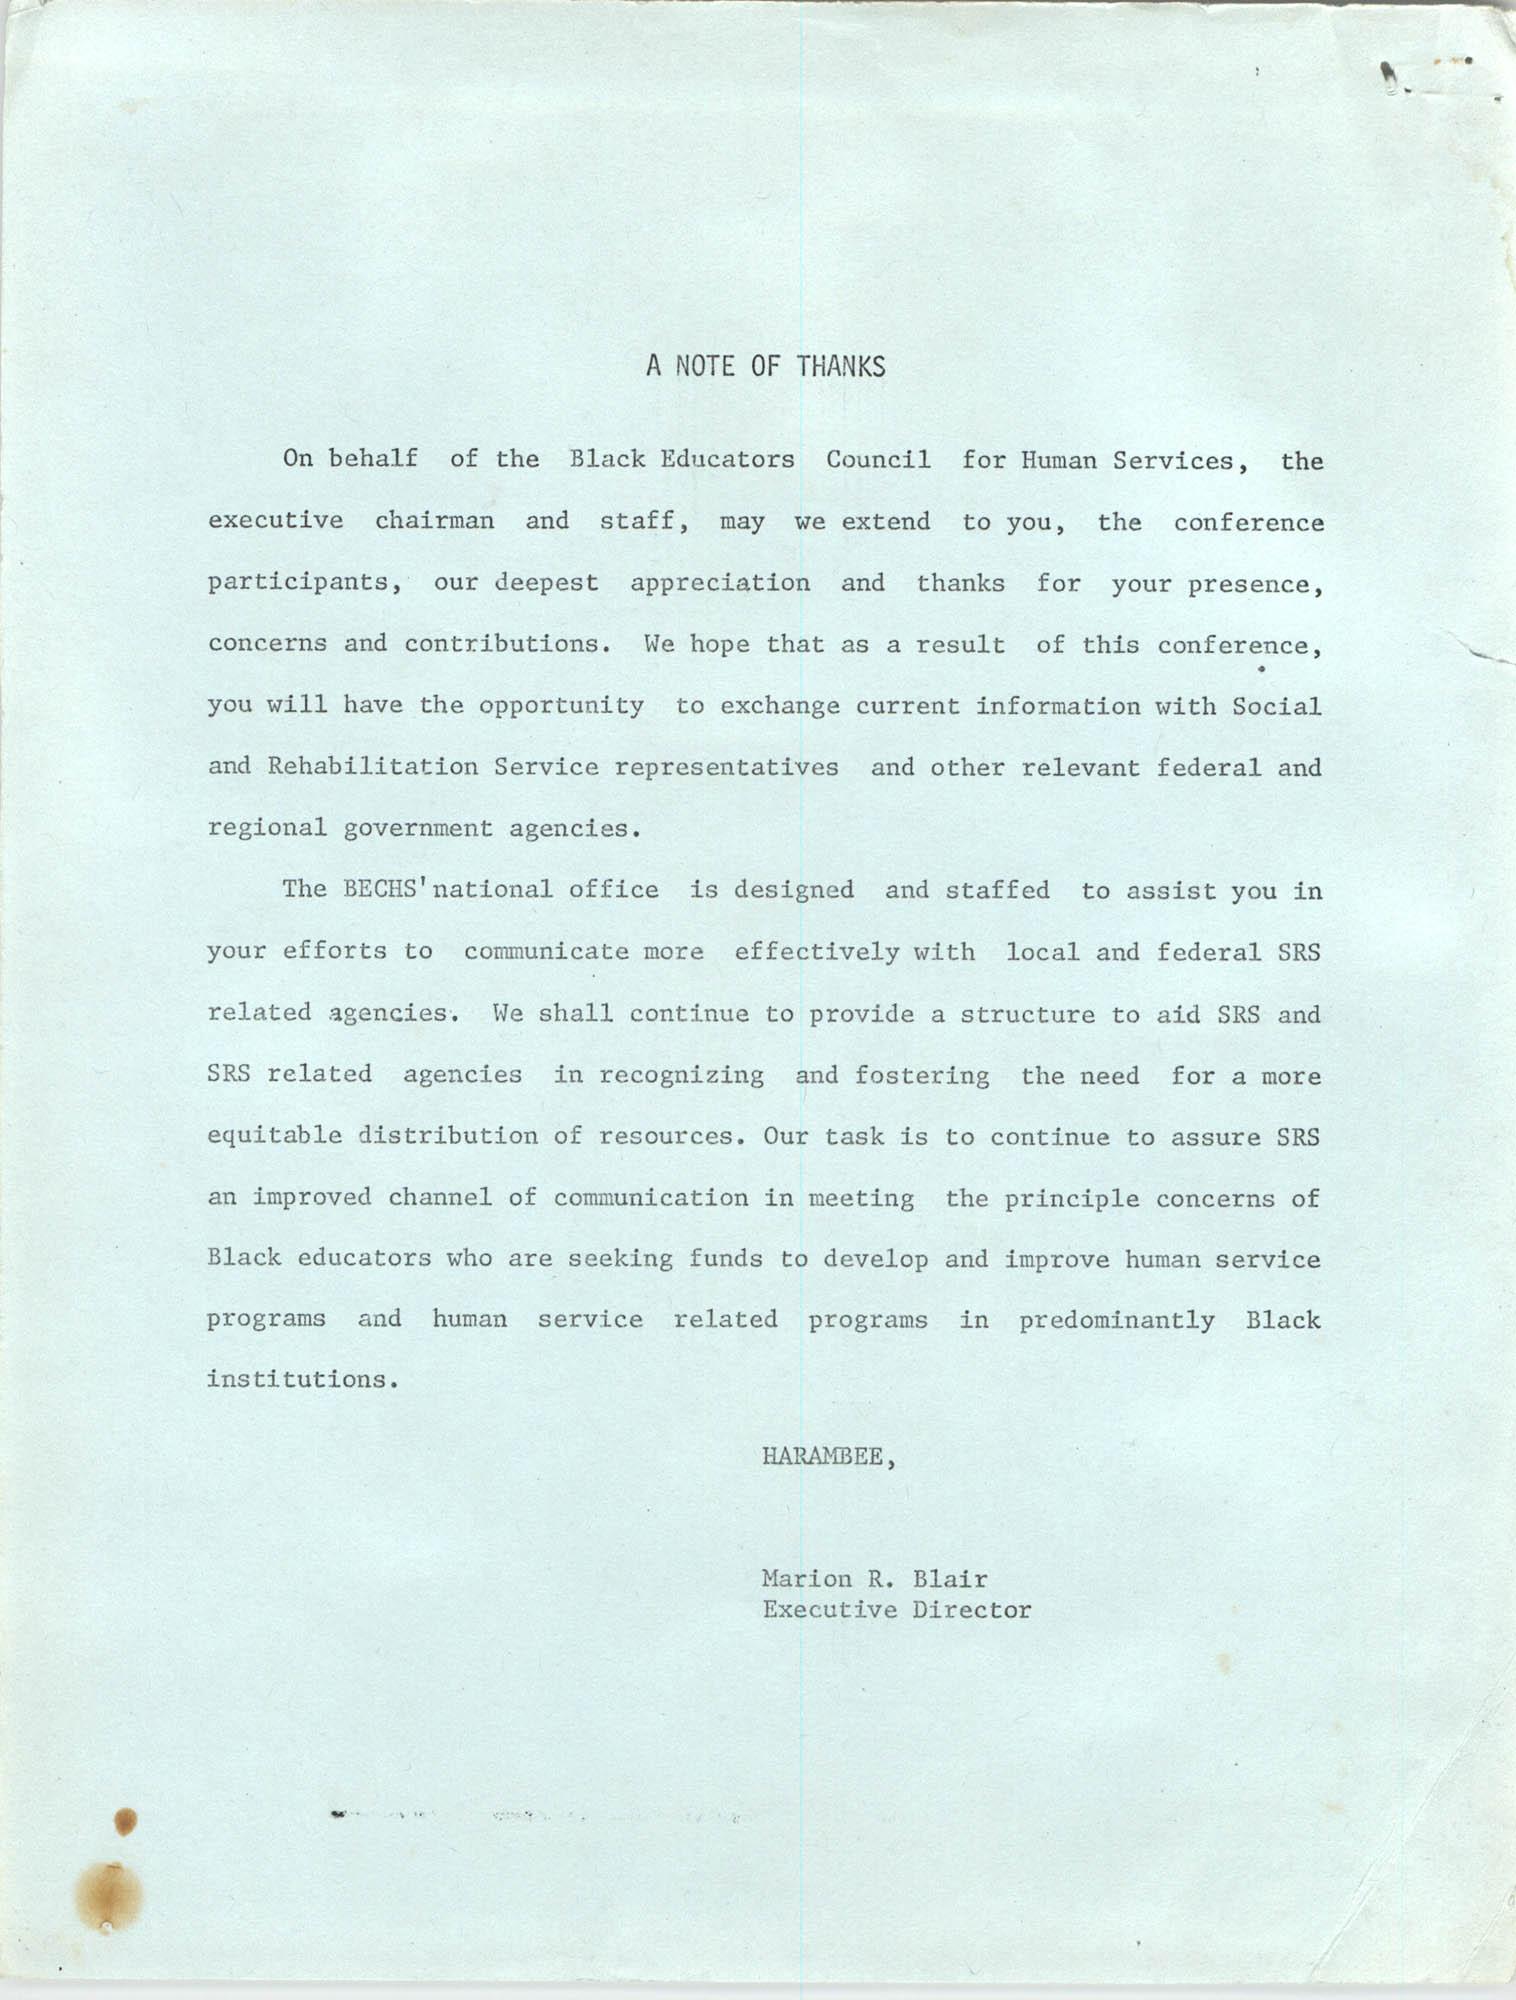 SHARE, Volume I, Number 8, April 1973, Cover Interior